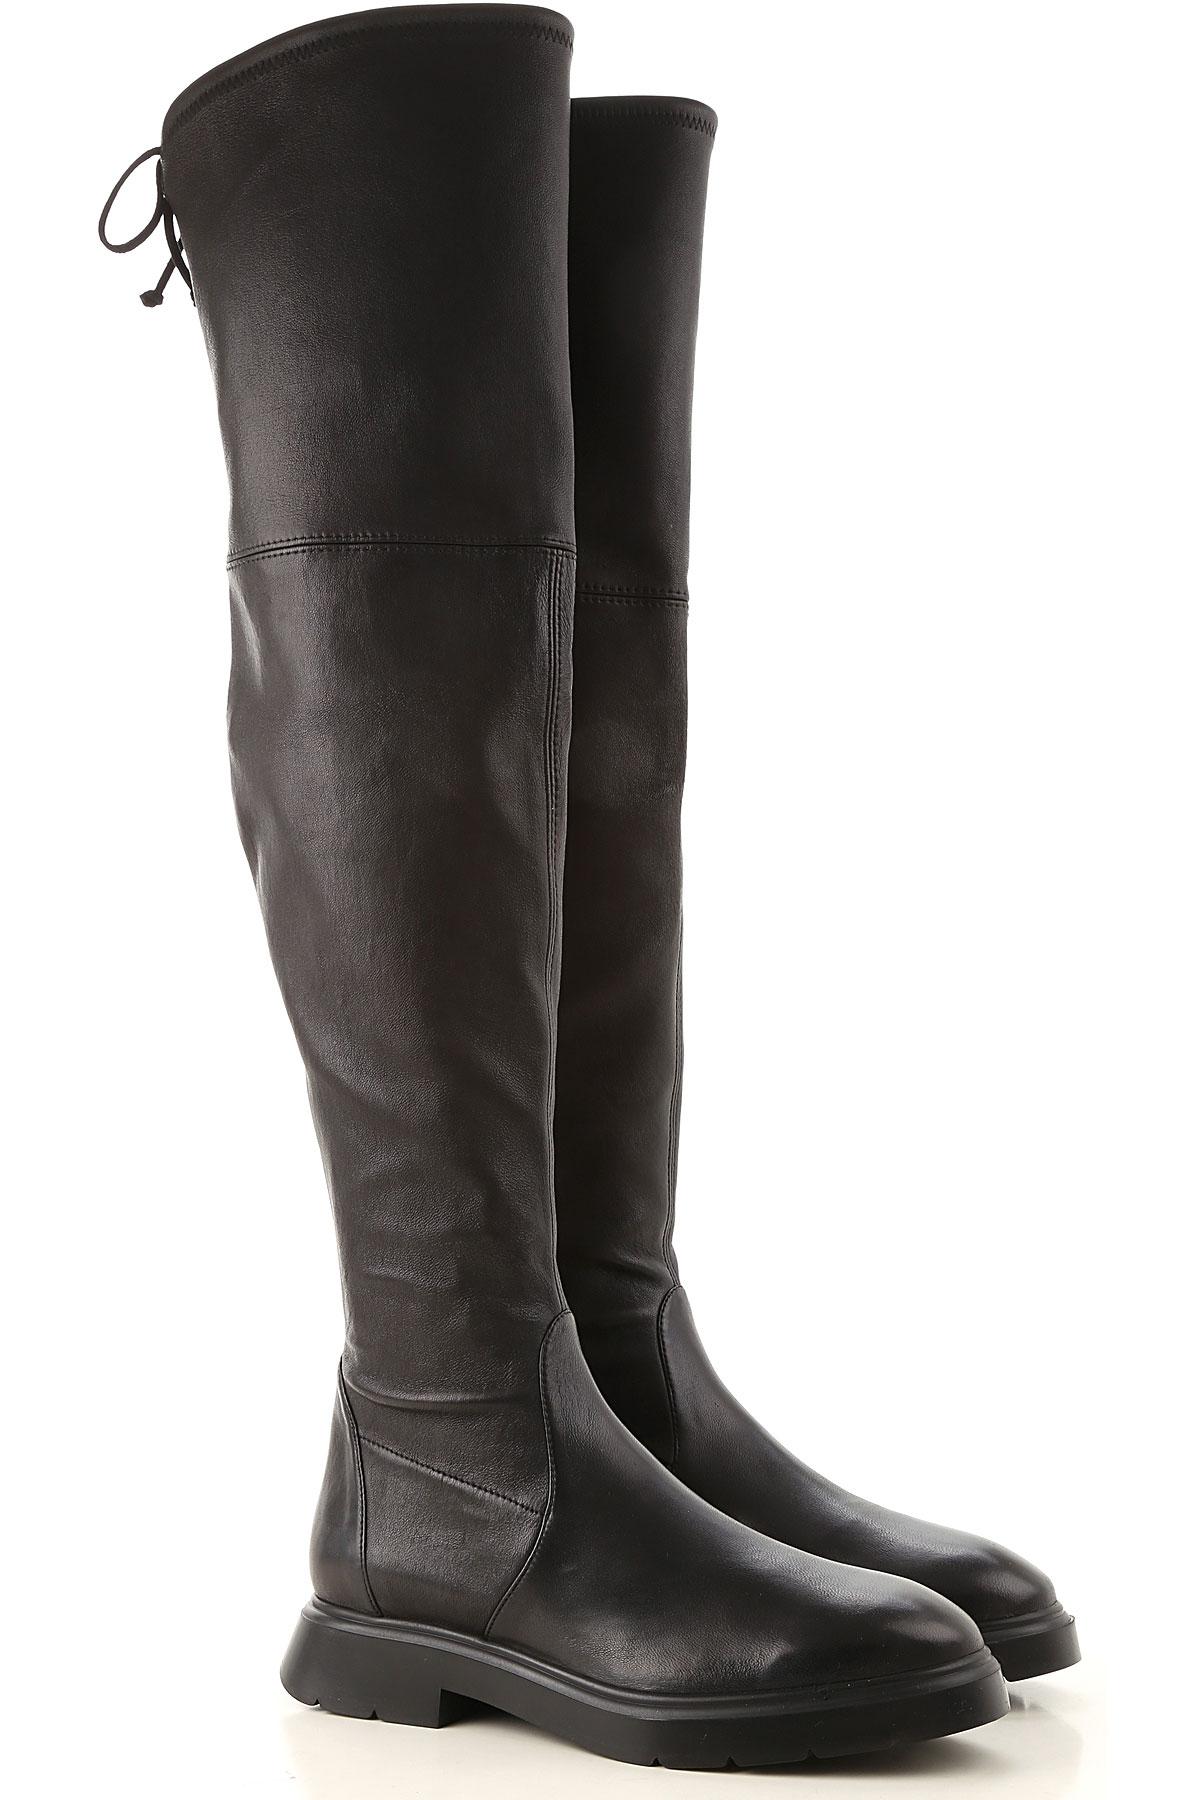 Stuart Weitzman Boots for Women, Booties On Sale, Black, Leather, 2019, US 6.5 (EU 37) US 8.5 (EU 39)